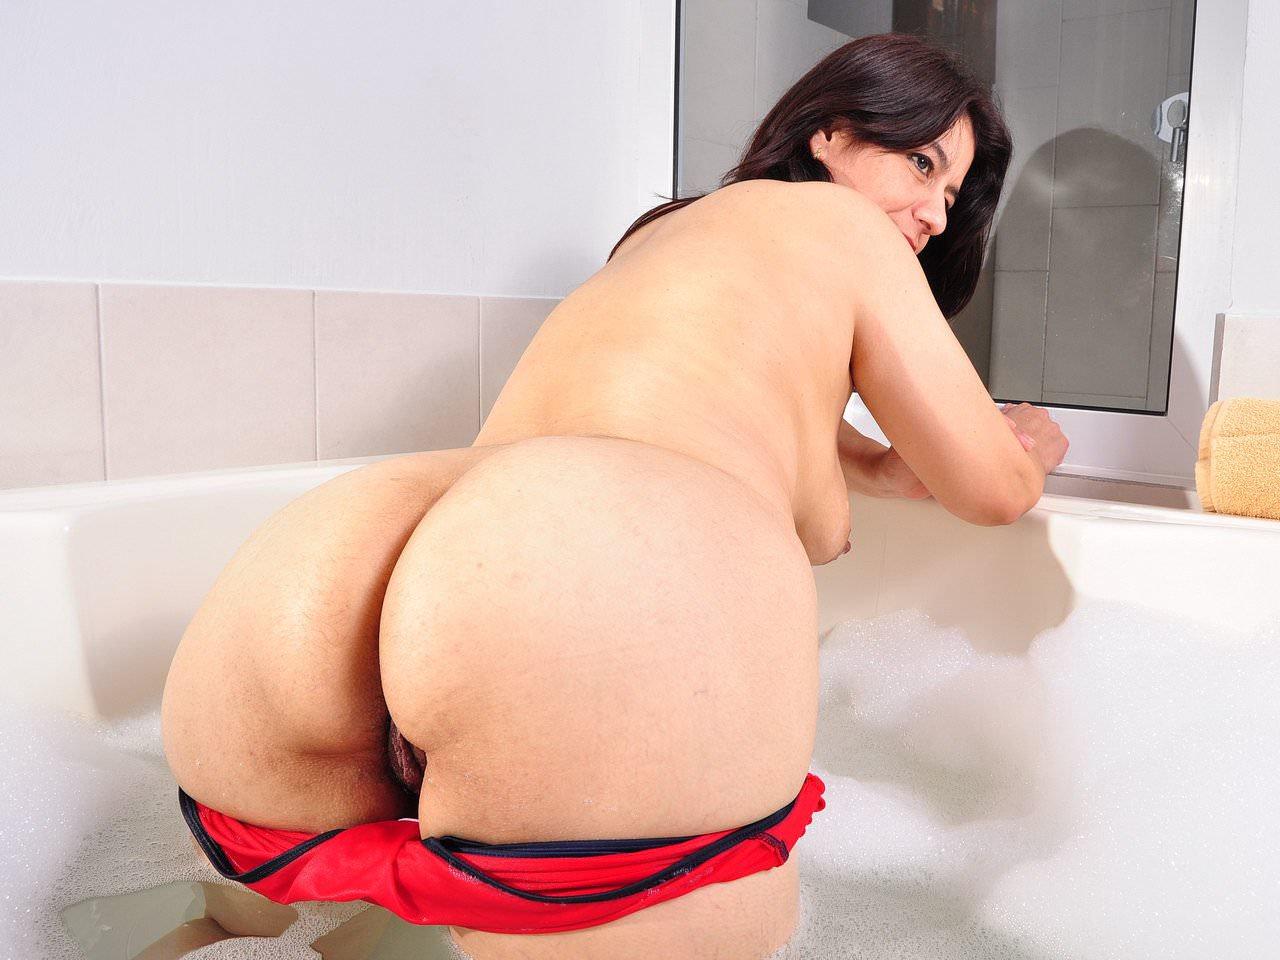 Anabel Latina Porno Española latina milf anabella needs a relaxing bath: free hd porn 4c